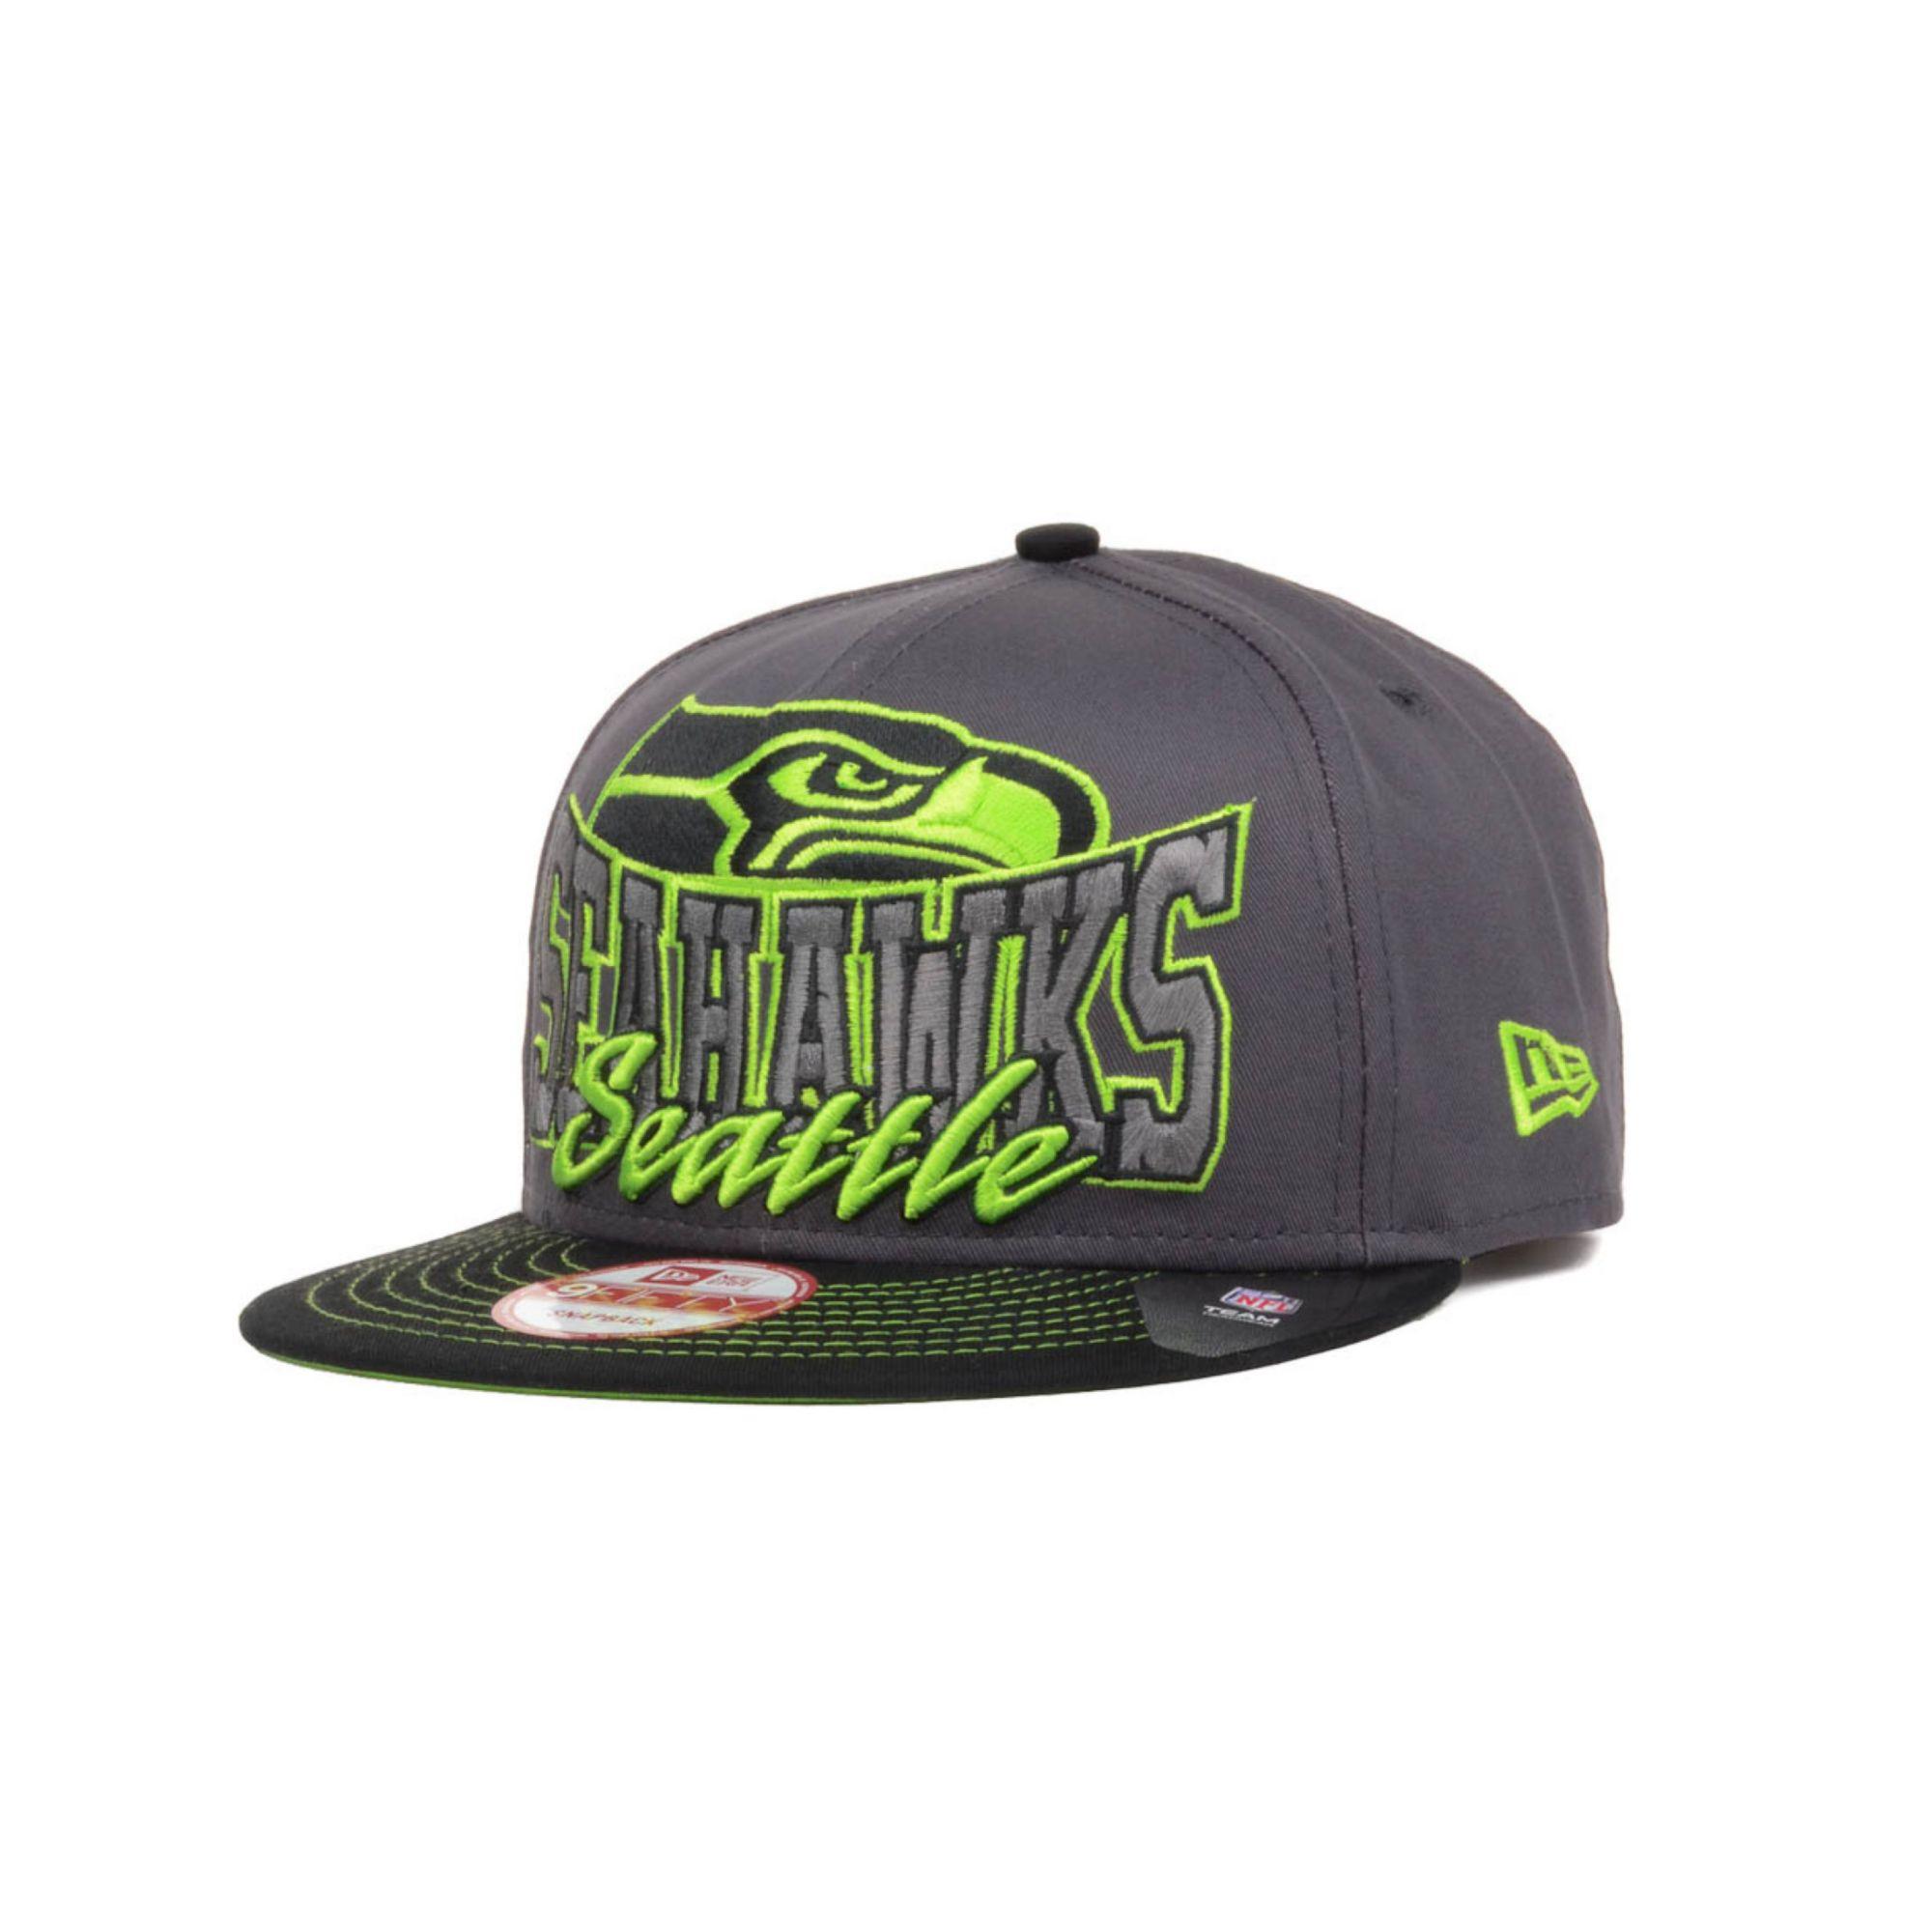 Men's Seattle Seahawks New Era Green Flip Up Team Redux 9FIFTY Snapback Adjustable Hat